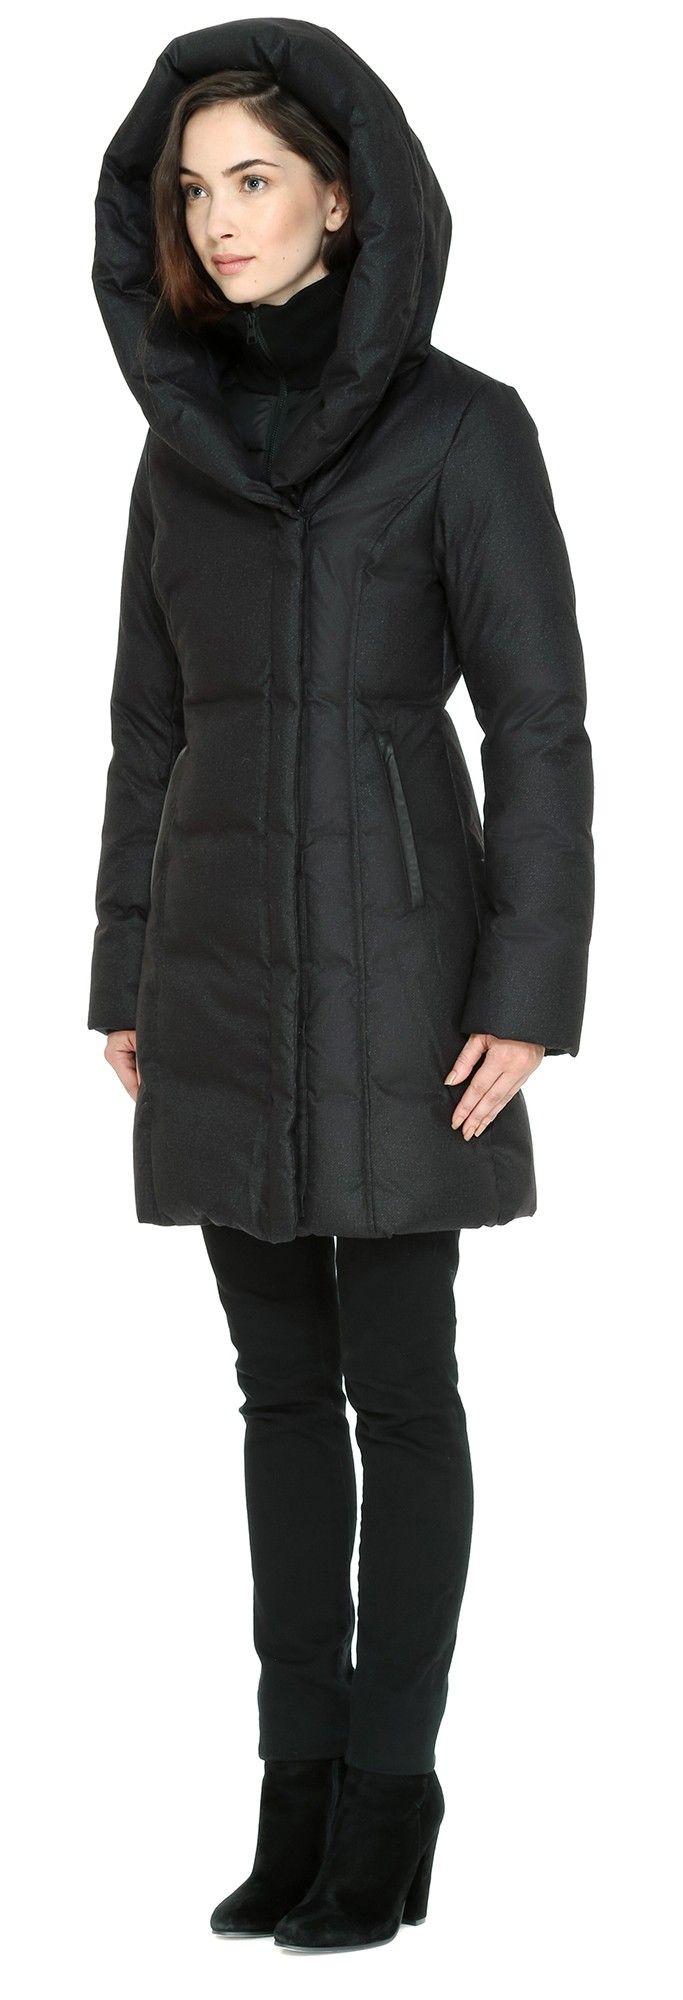 45 best Women's coats images on Pinterest | Women's coats, Down ...